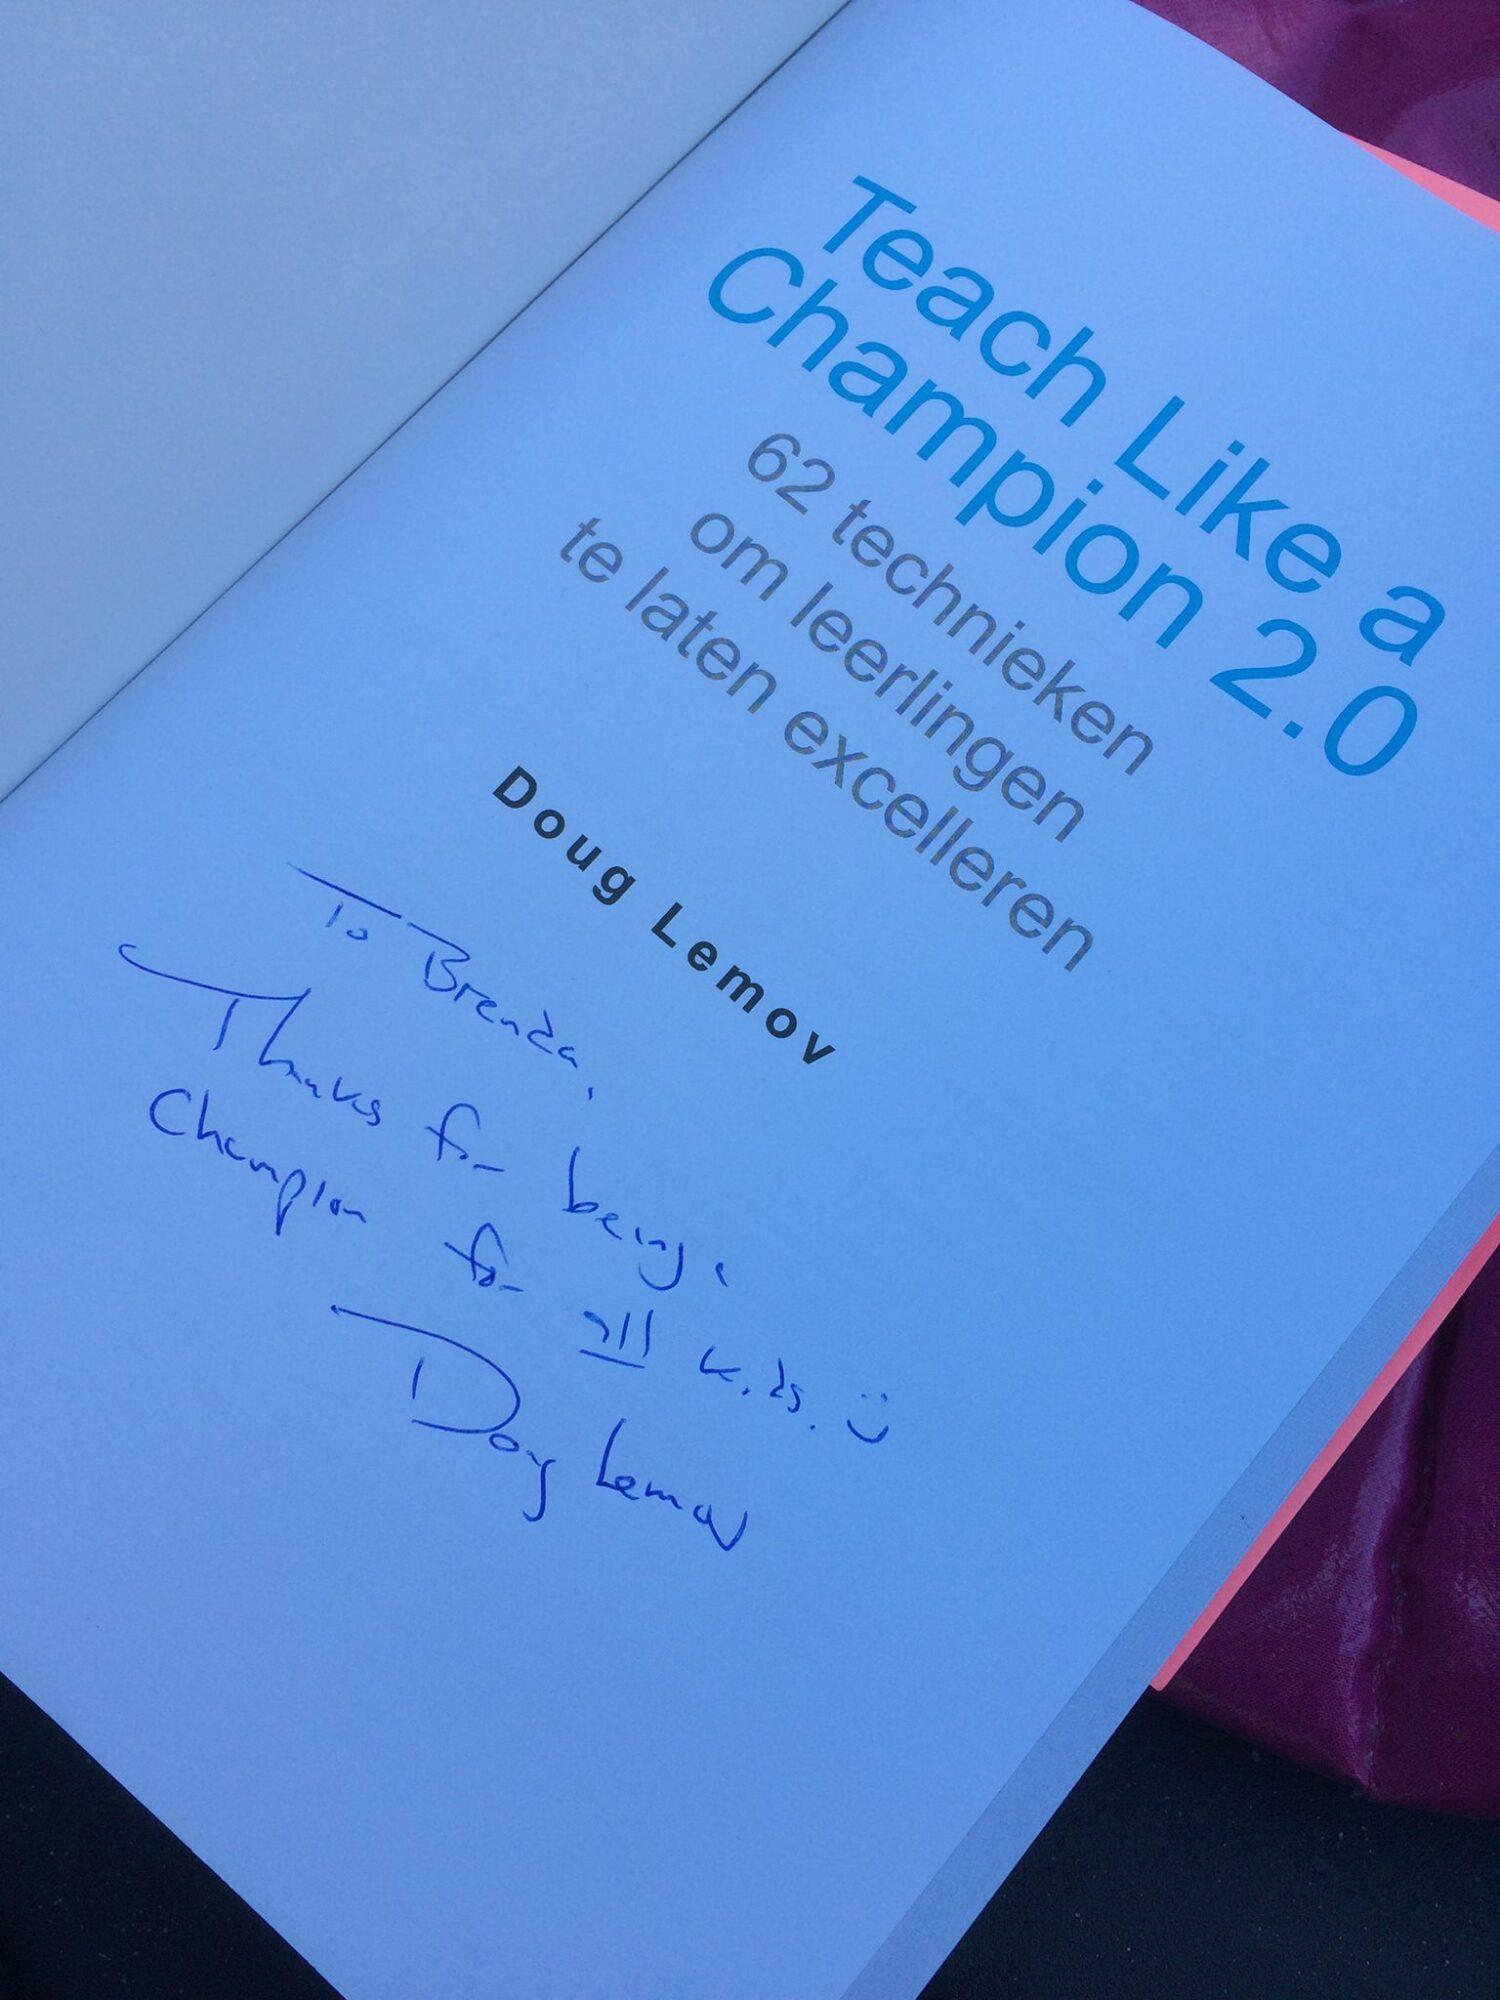 Gesigneerd boek Teach like a champion 2.0